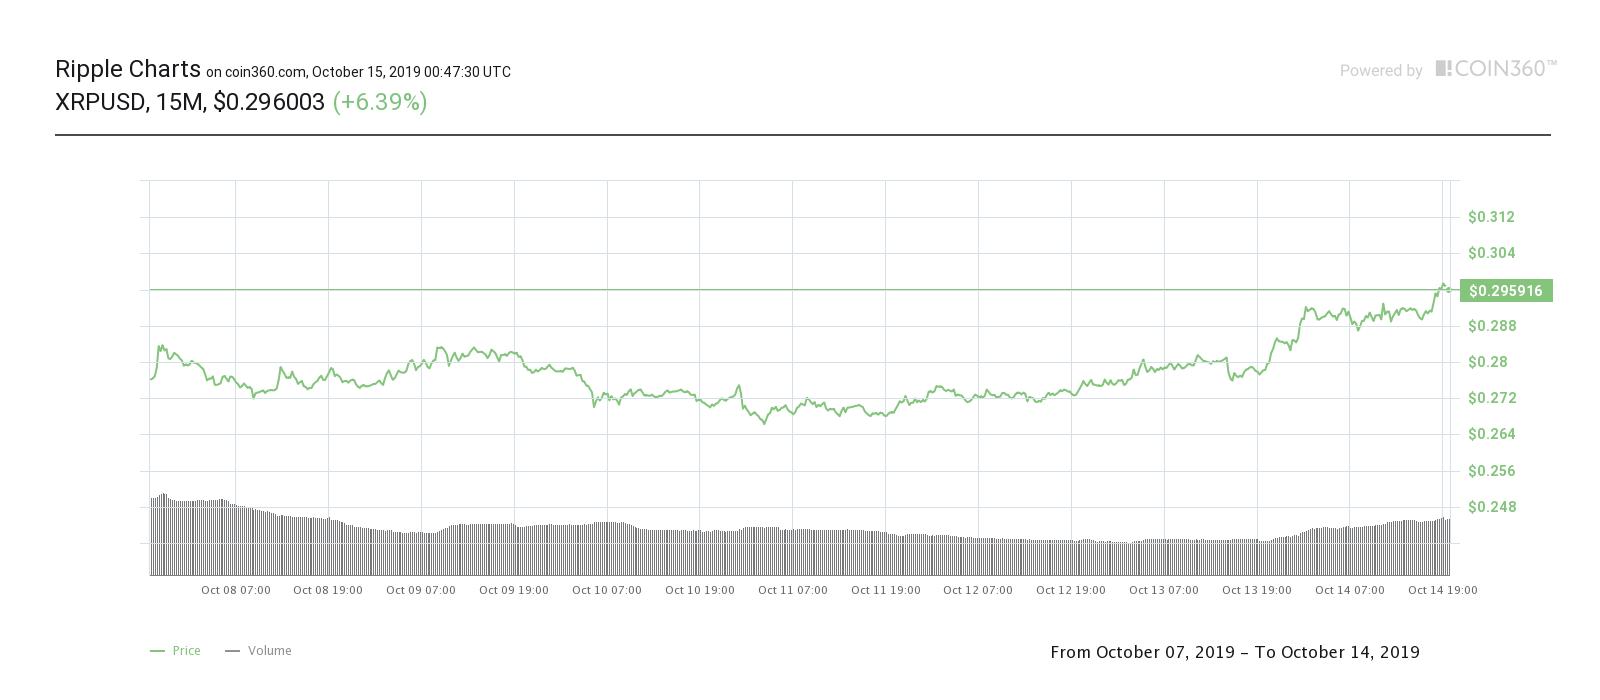 Bitcoin Price Touches $8,400 While 0x Jumps 16%, CryptoCoinNewsHub.com